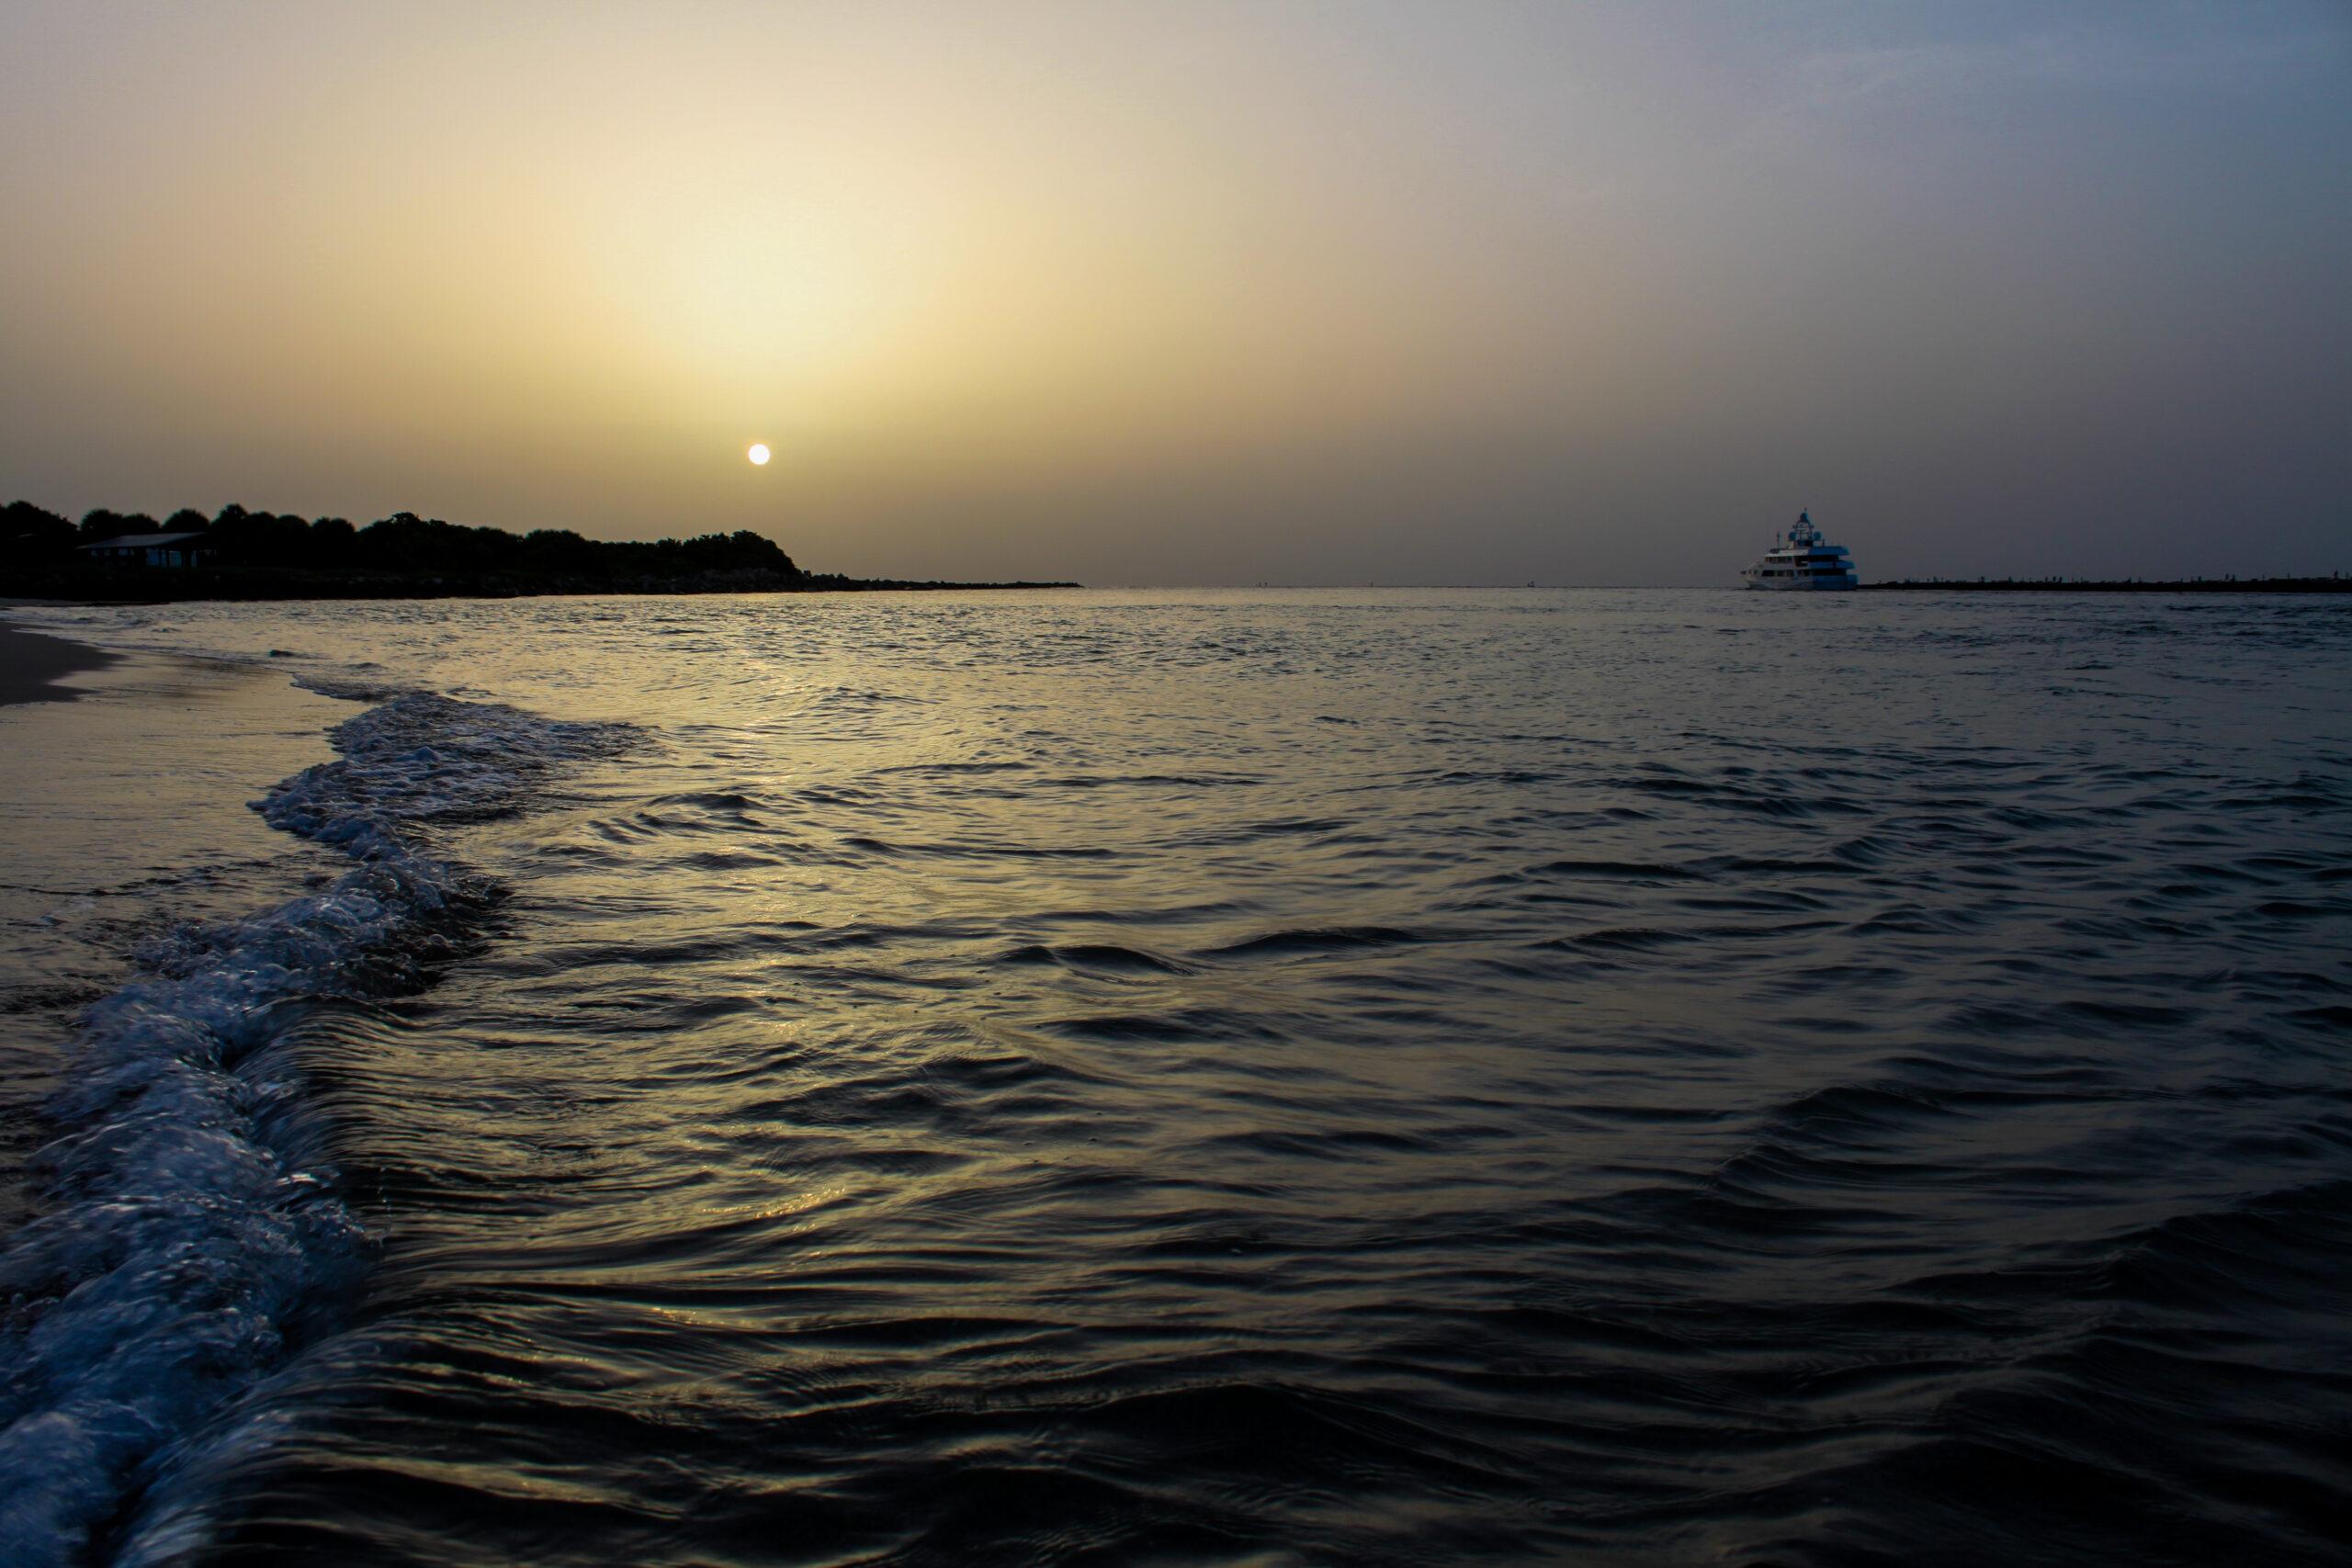 Vixit - Sahara Dust Sunrisejpg